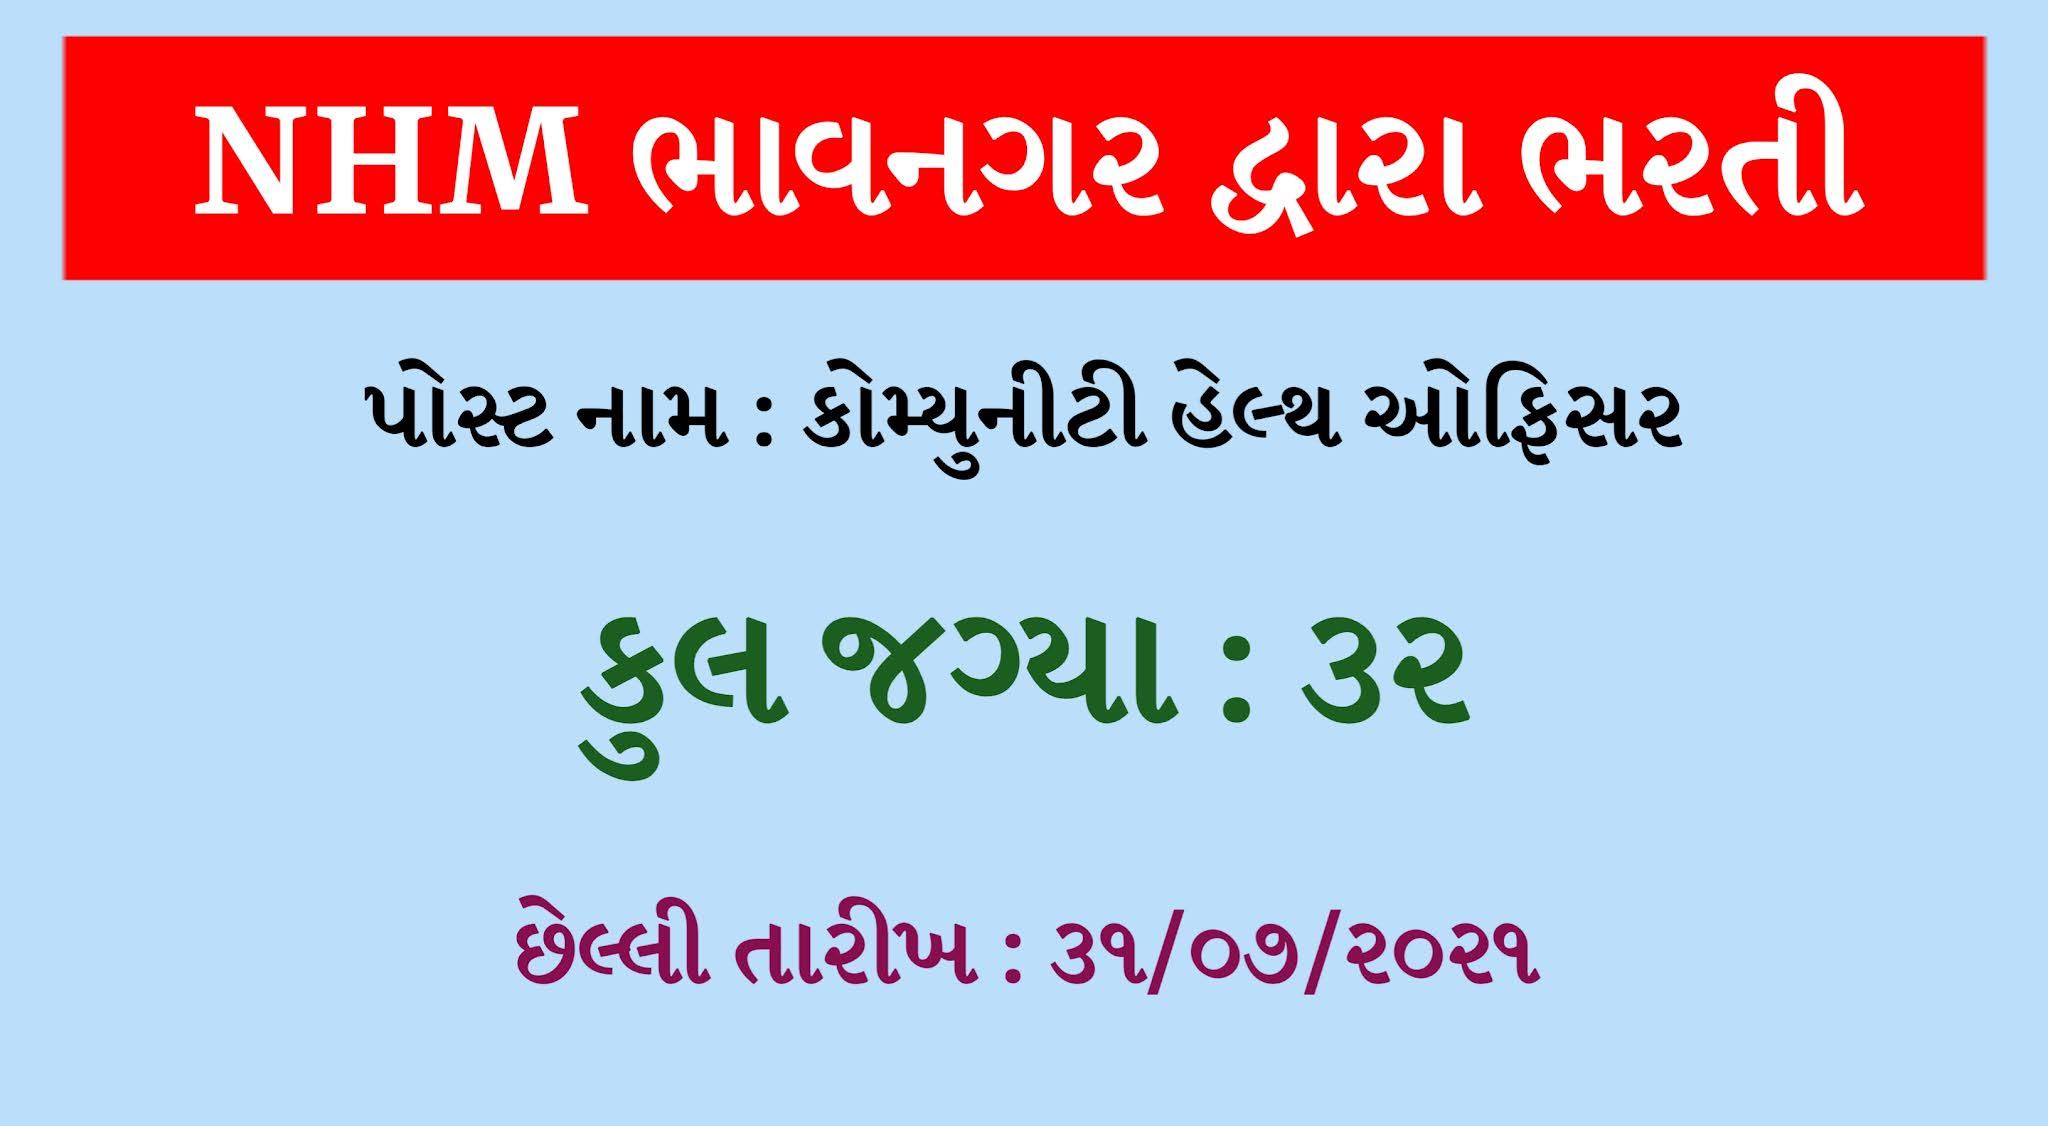 NHM Bhavnagar Recruitment Community Health Officer 2021, NHM Bhavnagar Recruitment 2021